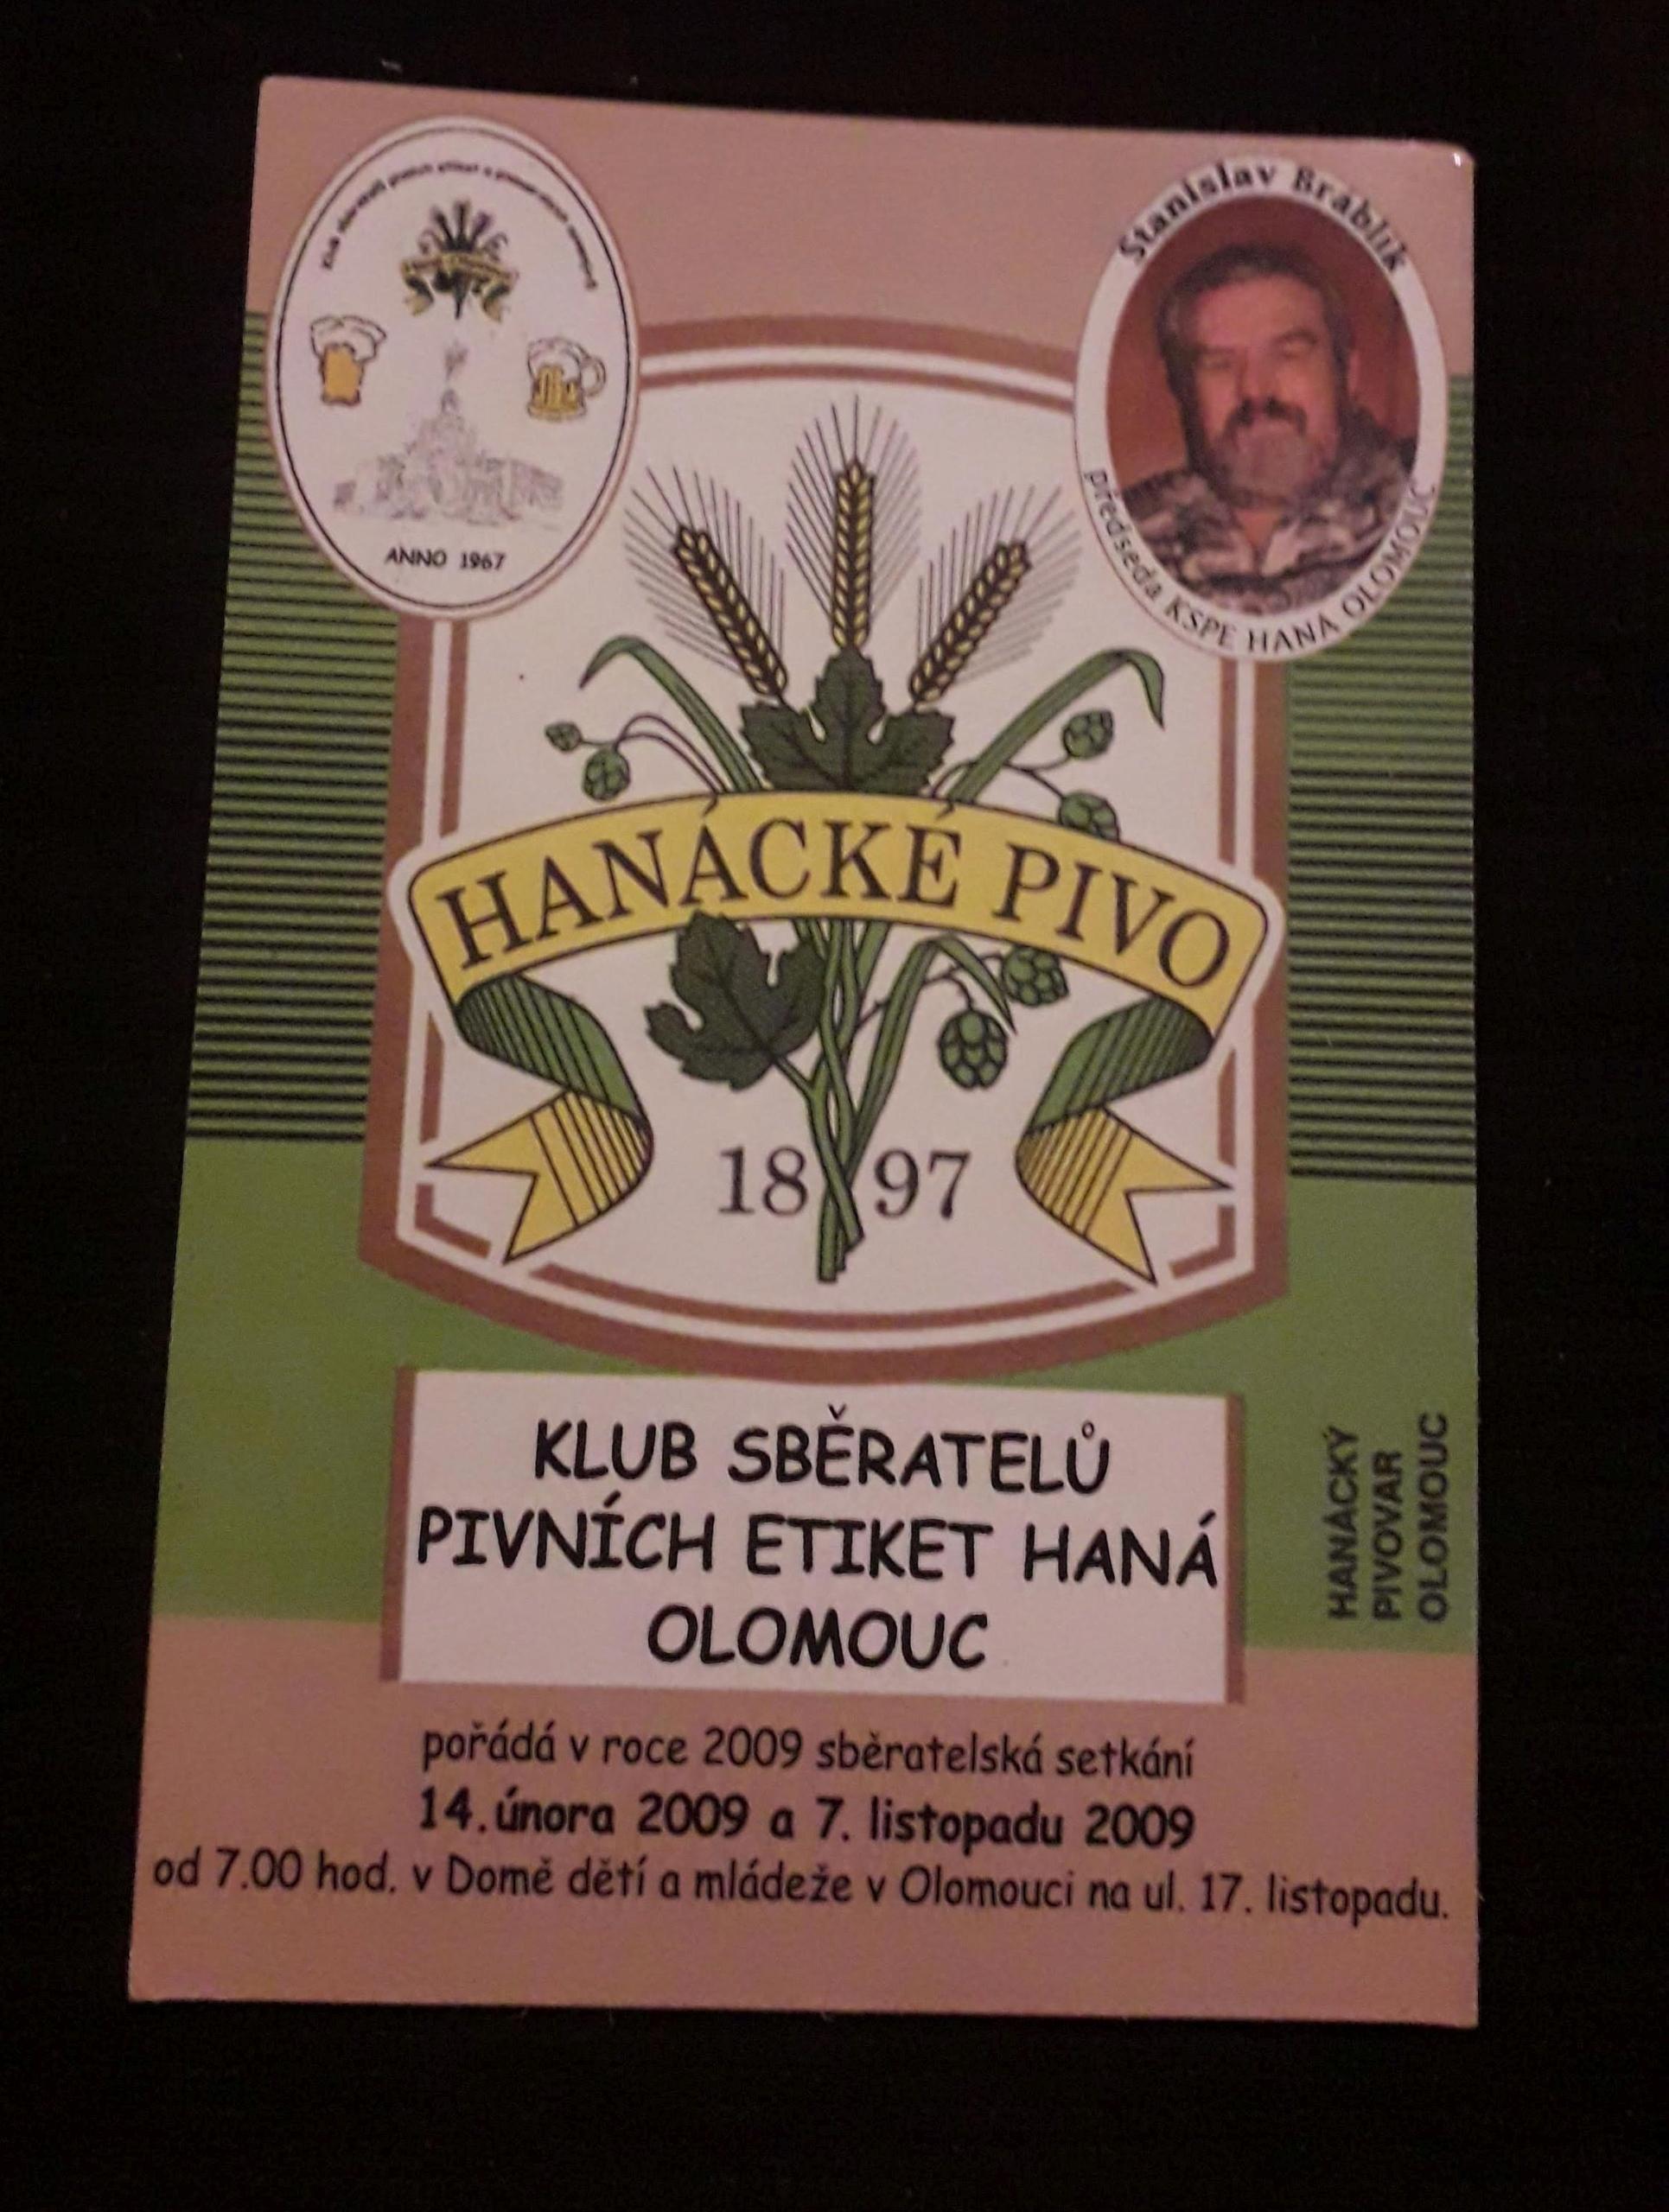 kalendarzyk HANACKE PIVO